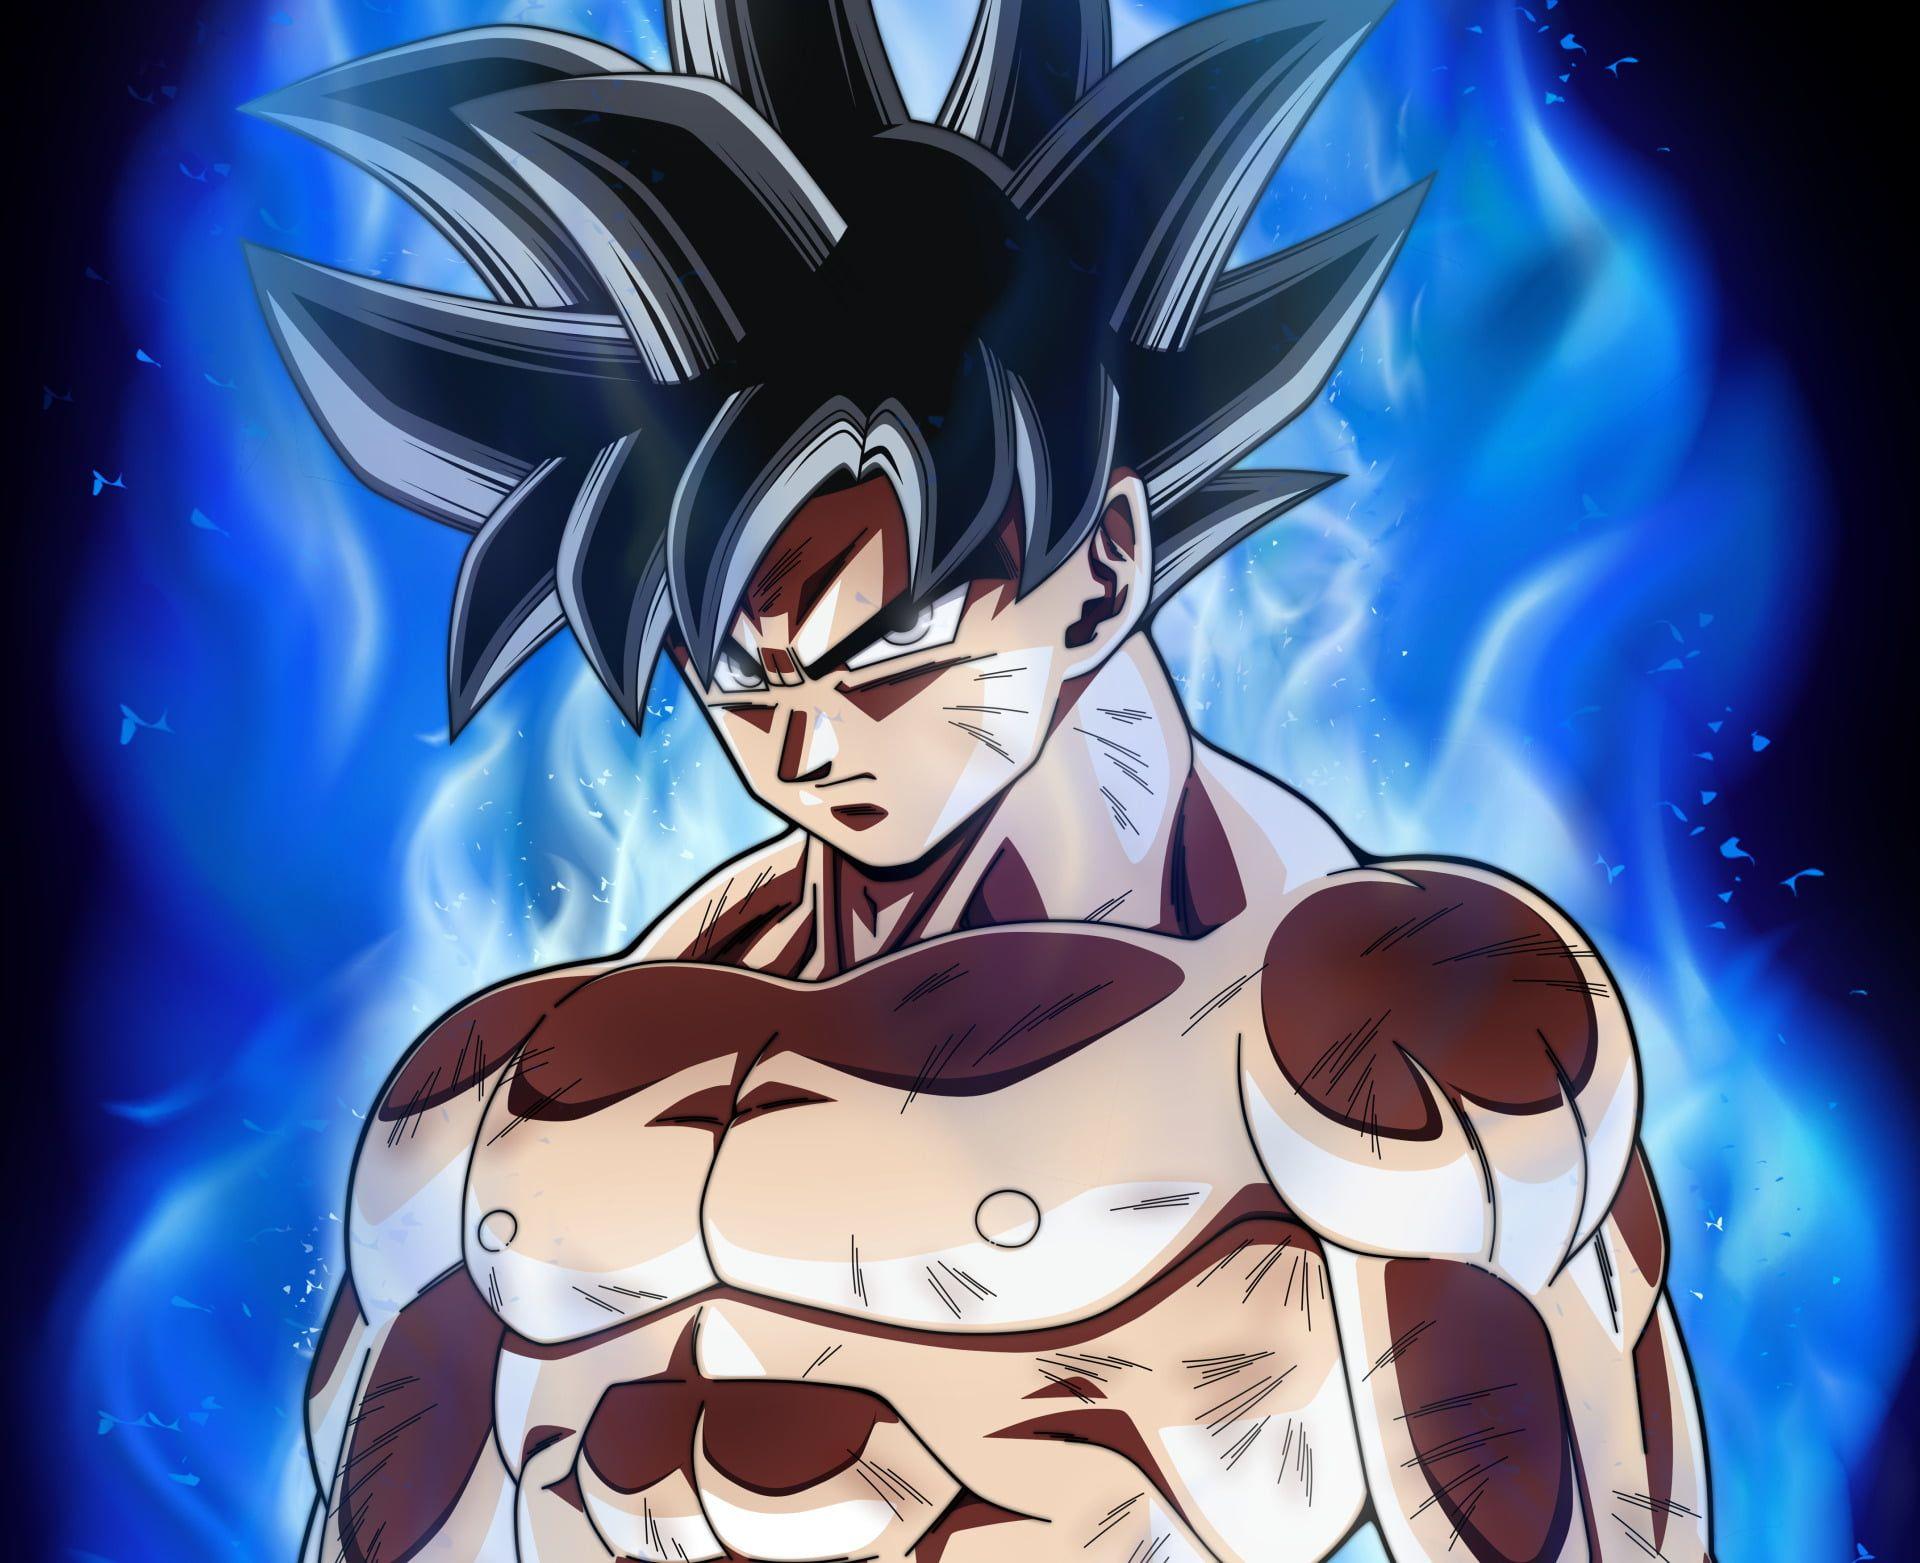 Ultra Instinct Goku Dragon Ball Dragon Ball Super Goku Ultra Instinct Dragon Ball In 2020 Dragon Ball Super Goku Anime Dragon Ball Super Dragon Ball Super Wallpapers